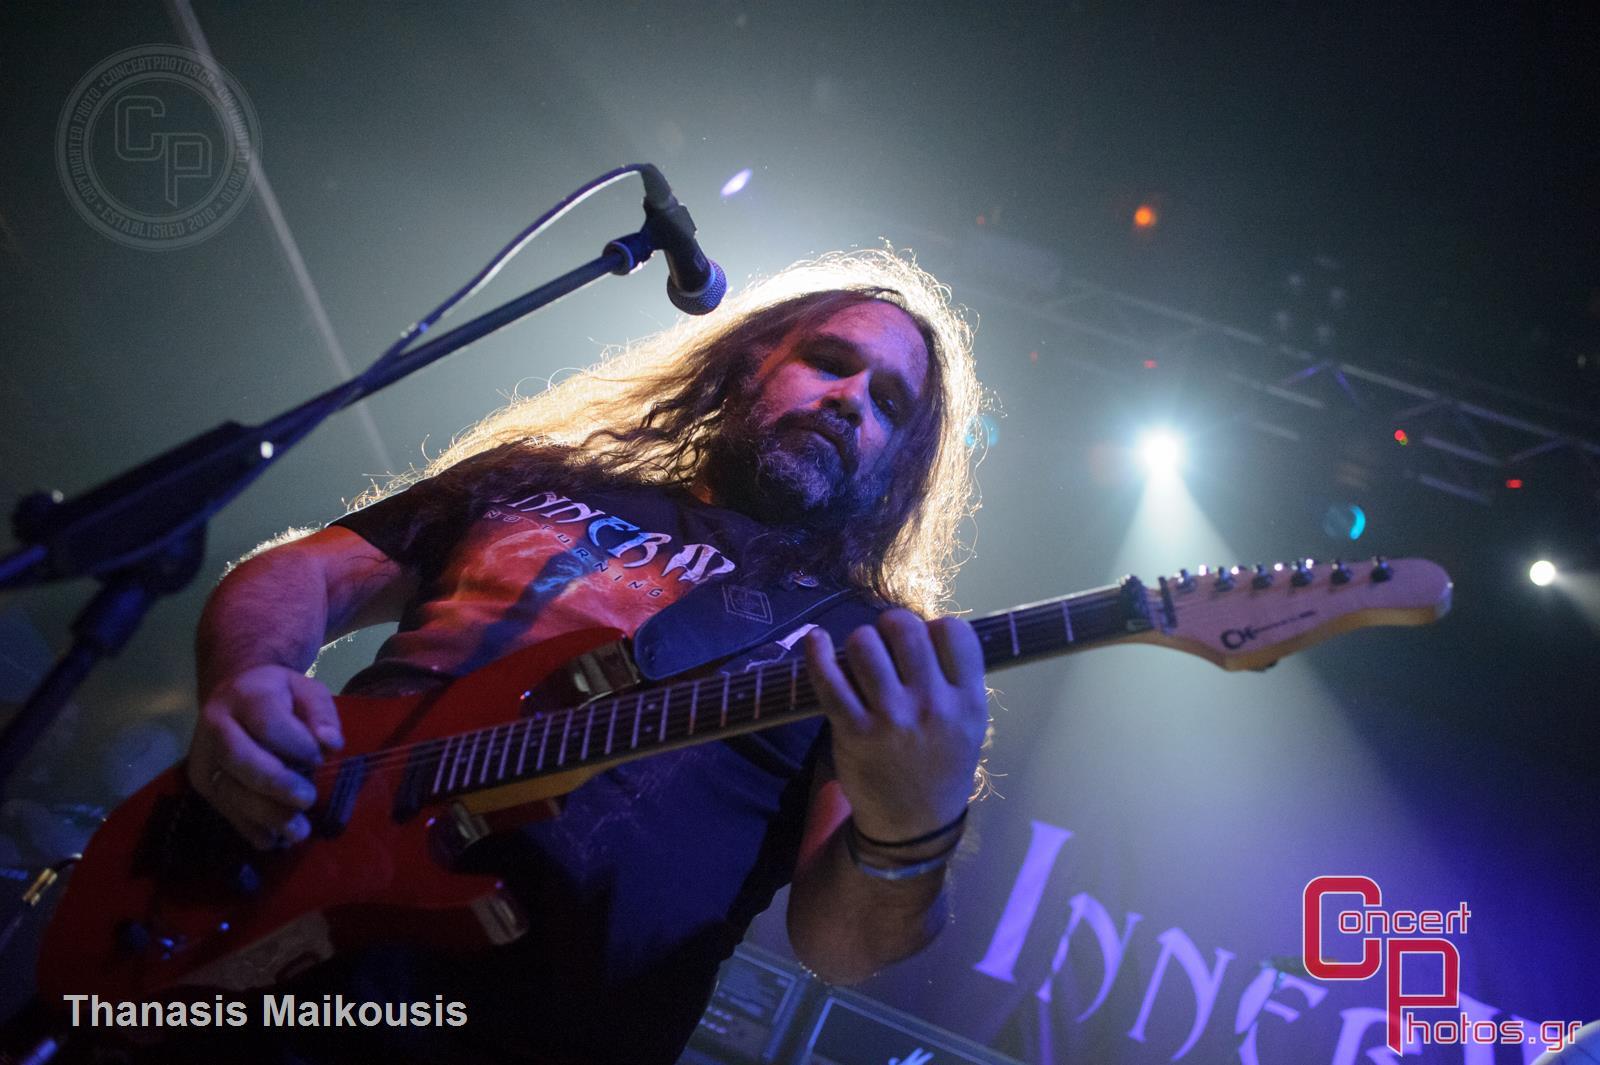 Saxon & Innerwish -Saxon Innerwish Gagarin photographer: Thanasis Maikousis - concertphotos_20141025_21_09_43